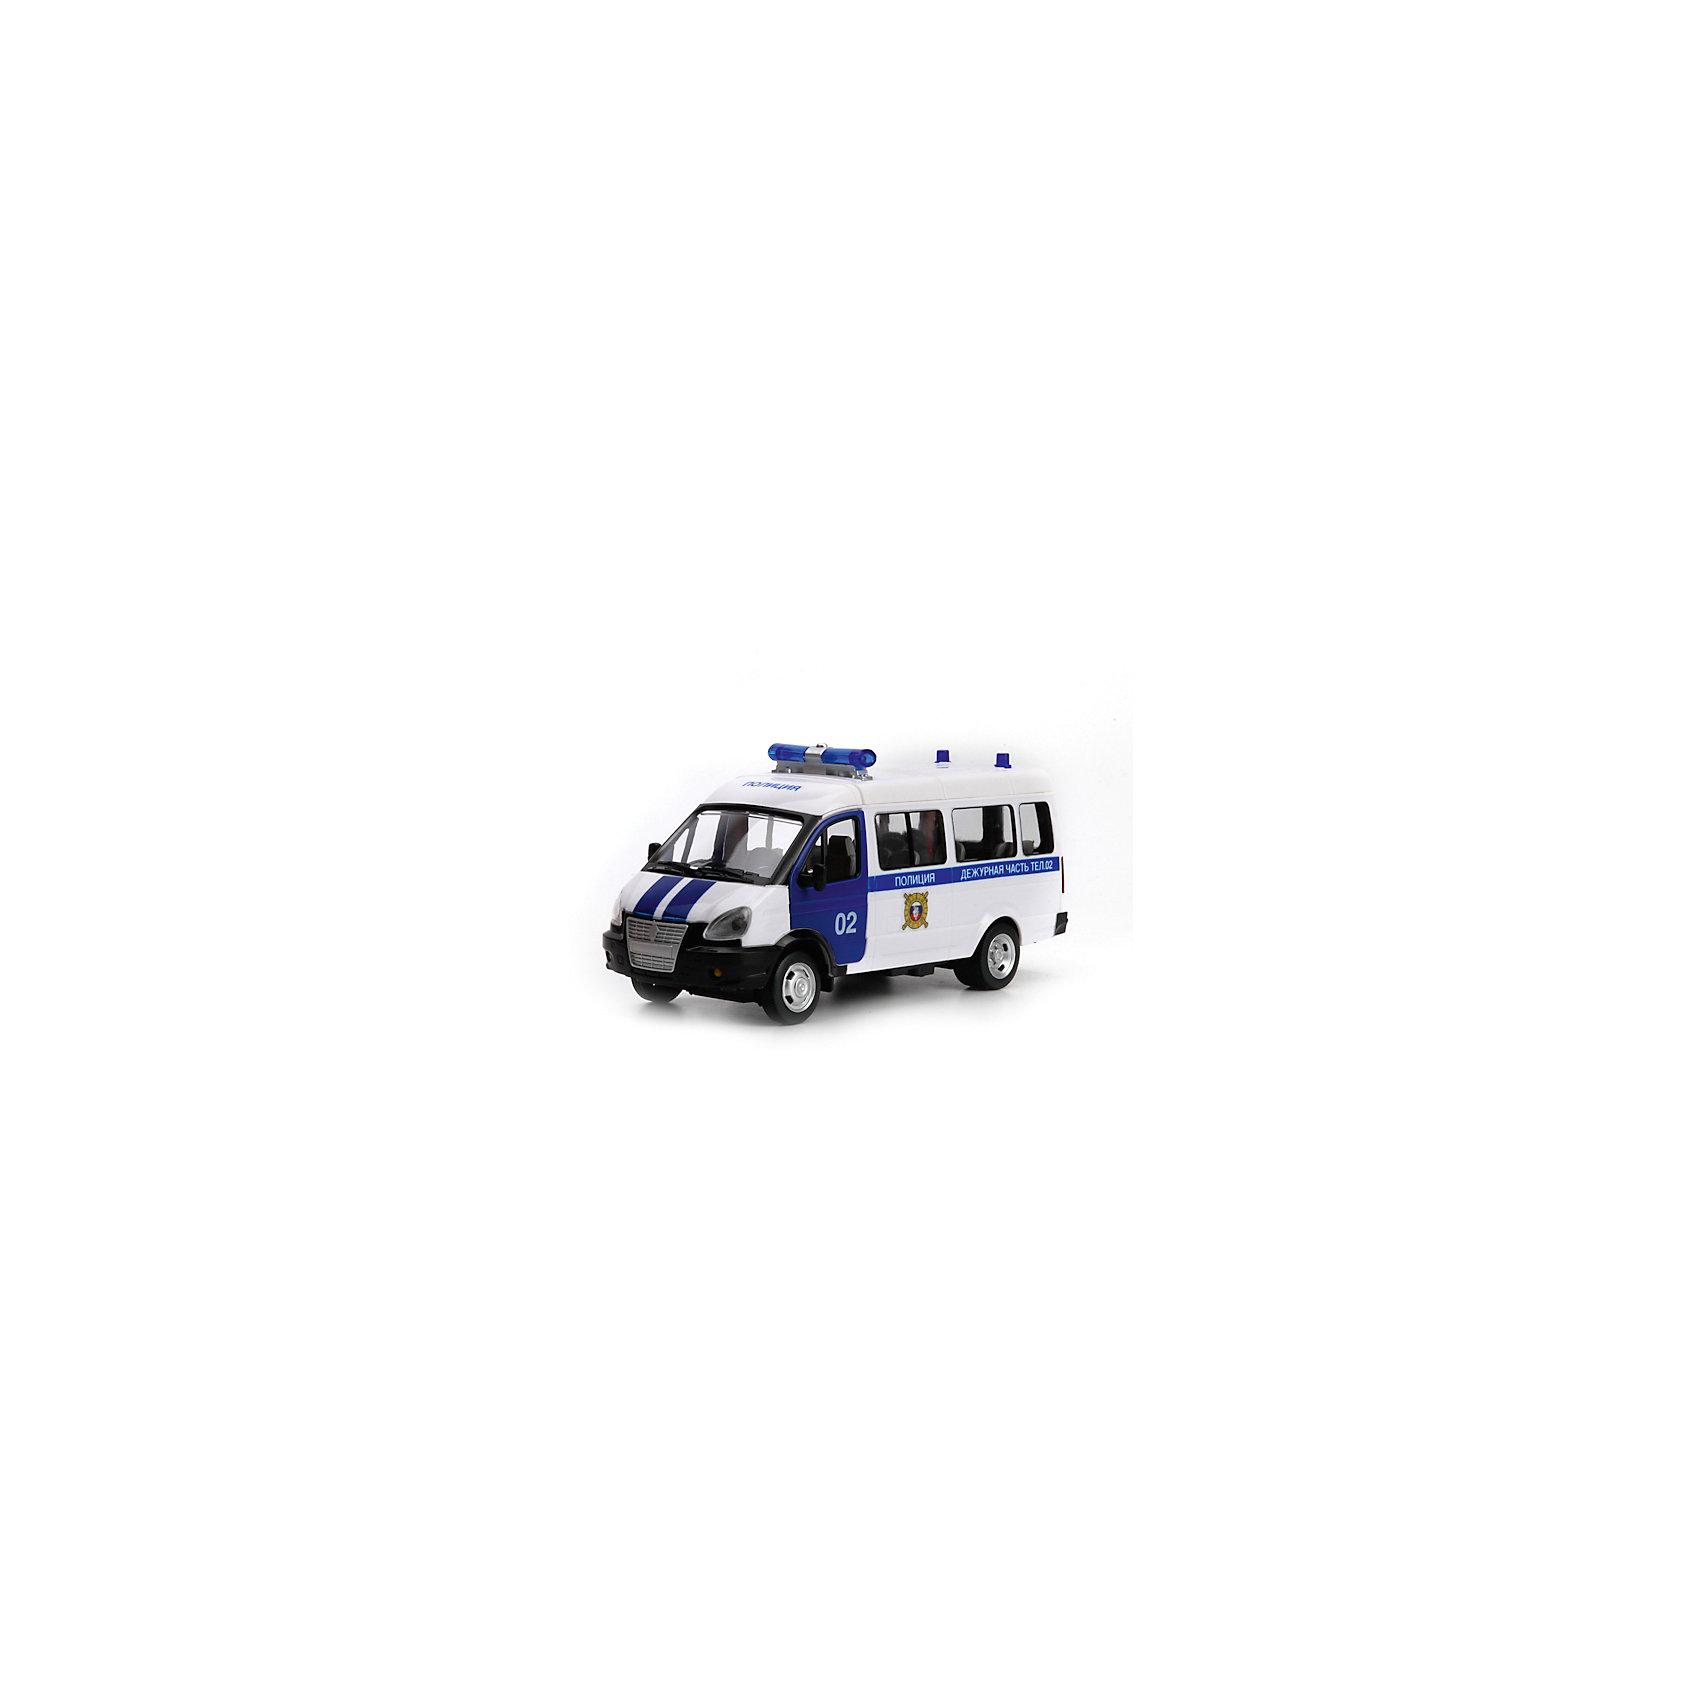 Машина ГАЗ Газель Полиция, свет+звук, ТЕХНОПАРКМашинки<br>Машина Технопарк пластиковая инерционная ГАЗ. Газель Полиция, свет+звук.<br><br>Ширина мм: 110<br>Глубина мм: 150<br>Высота мм: 250<br>Вес г: 410<br>Возраст от месяцев: 36<br>Возраст до месяцев: 84<br>Пол: Мужской<br>Возраст: Детский<br>SKU: 5420391